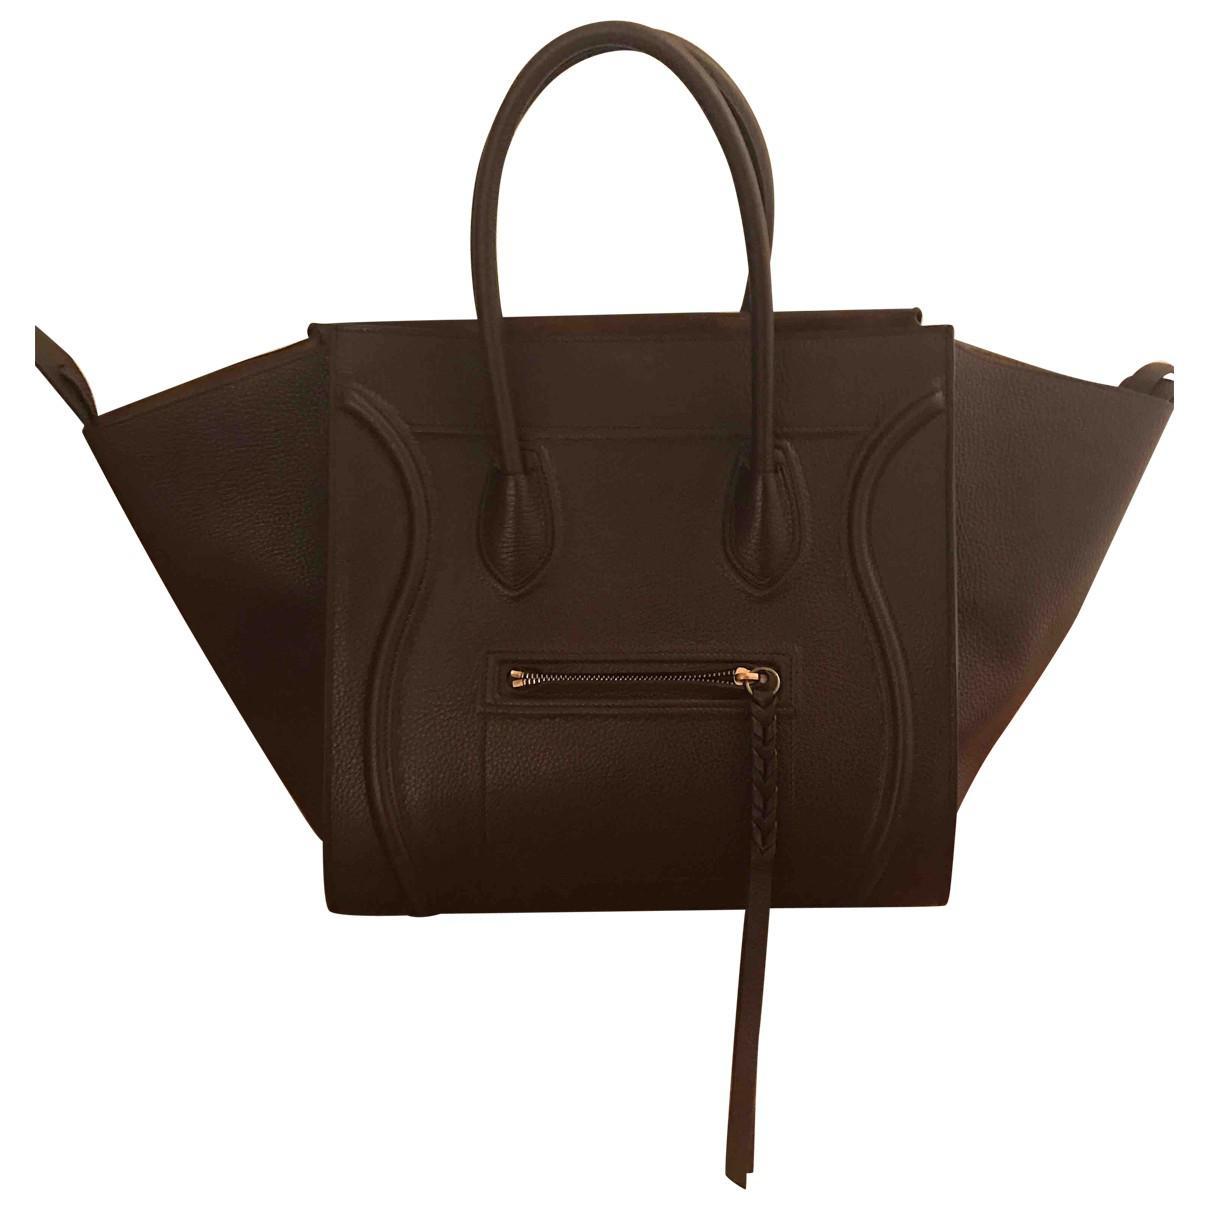 Pre-owned - Luggage Phantom leather bag Celine ibwEB5